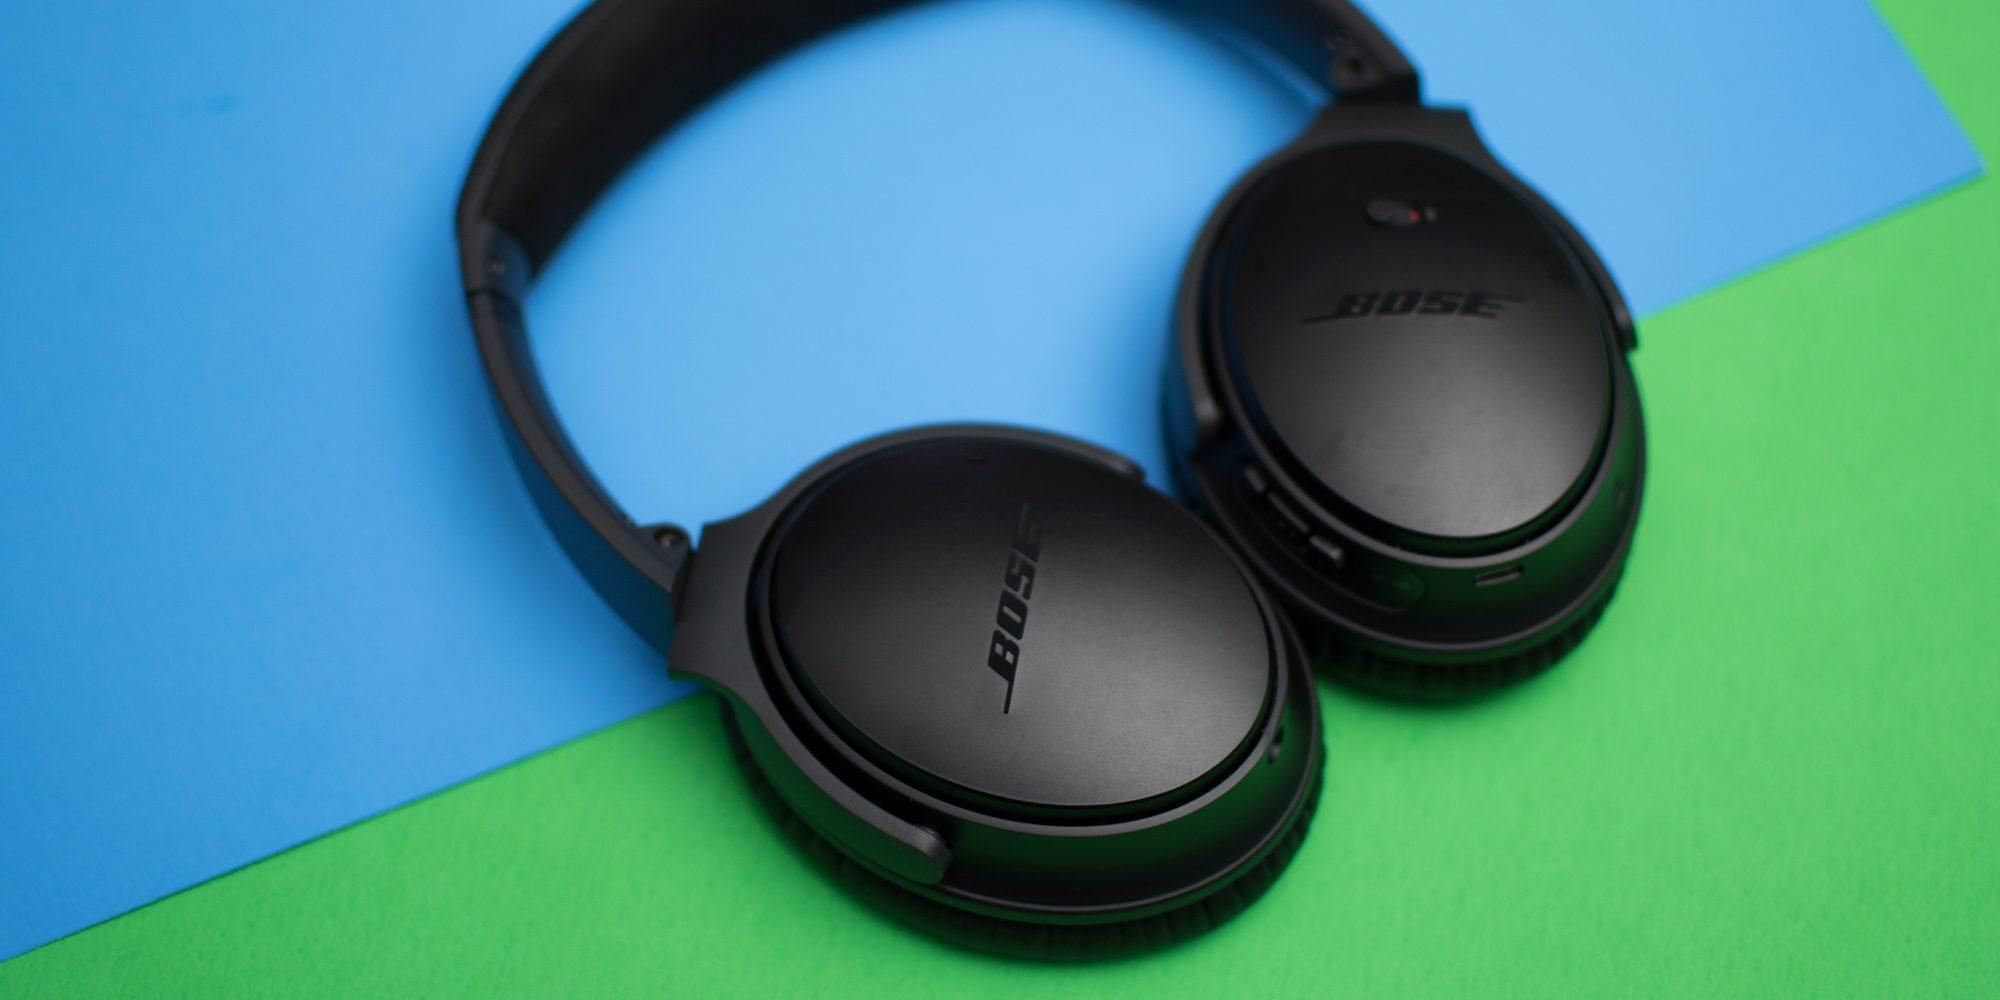 9to5Toys Lunch Break: Bose QC 35 Wireless Headphones $265, Motorola Moto X4 $250, Wemo Smart Dimmer $50, more